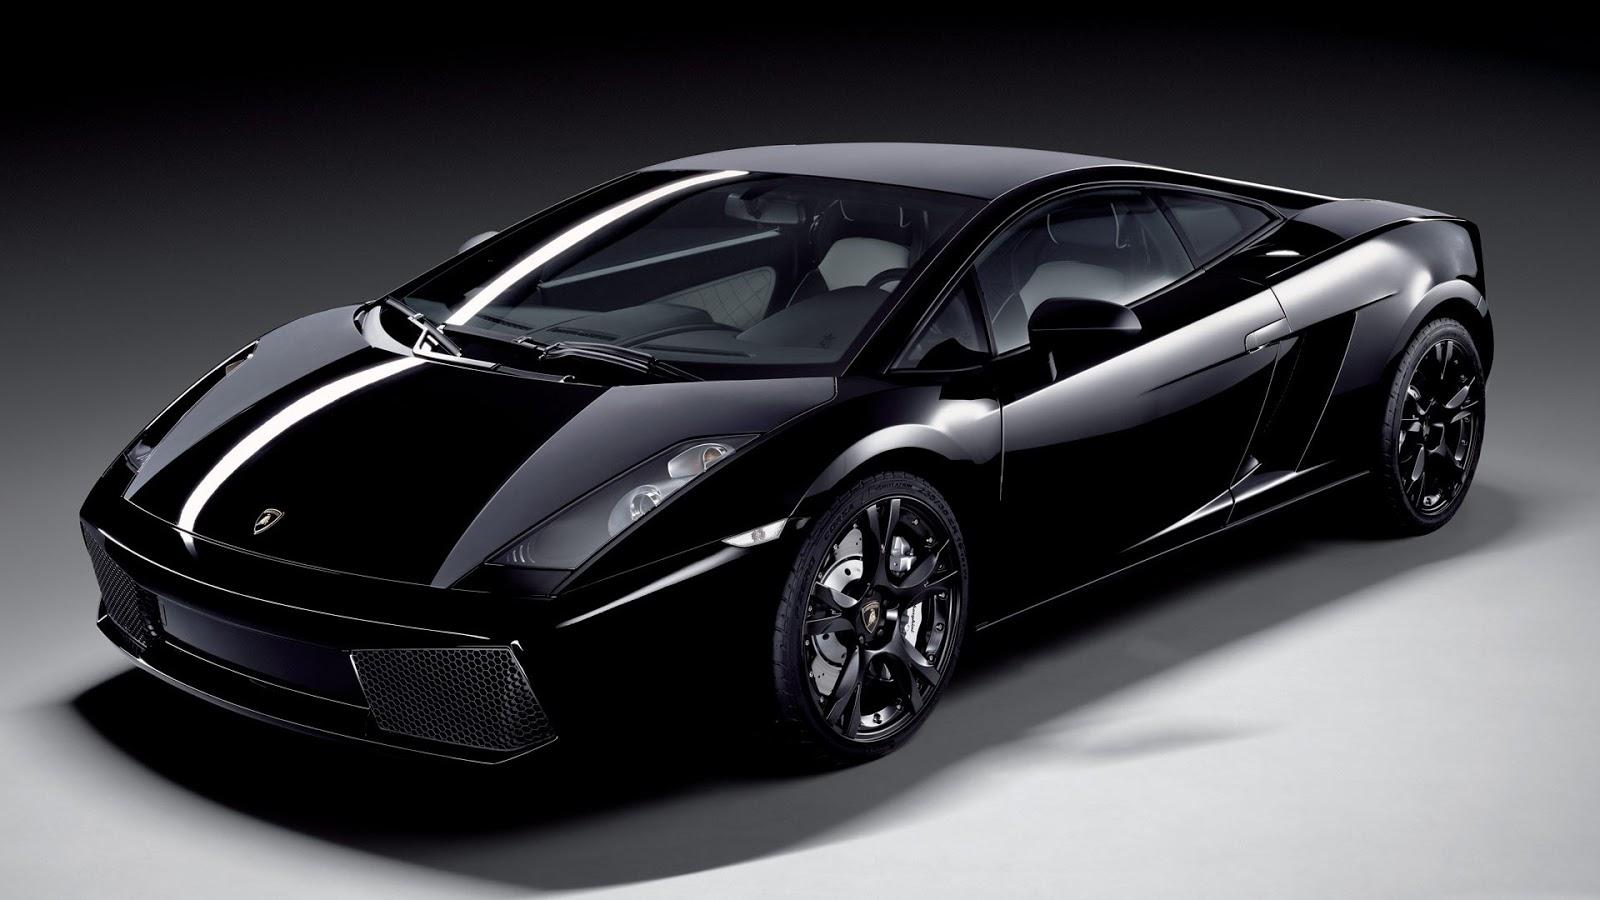 Lamborghini Gallardo Black Wallpaper